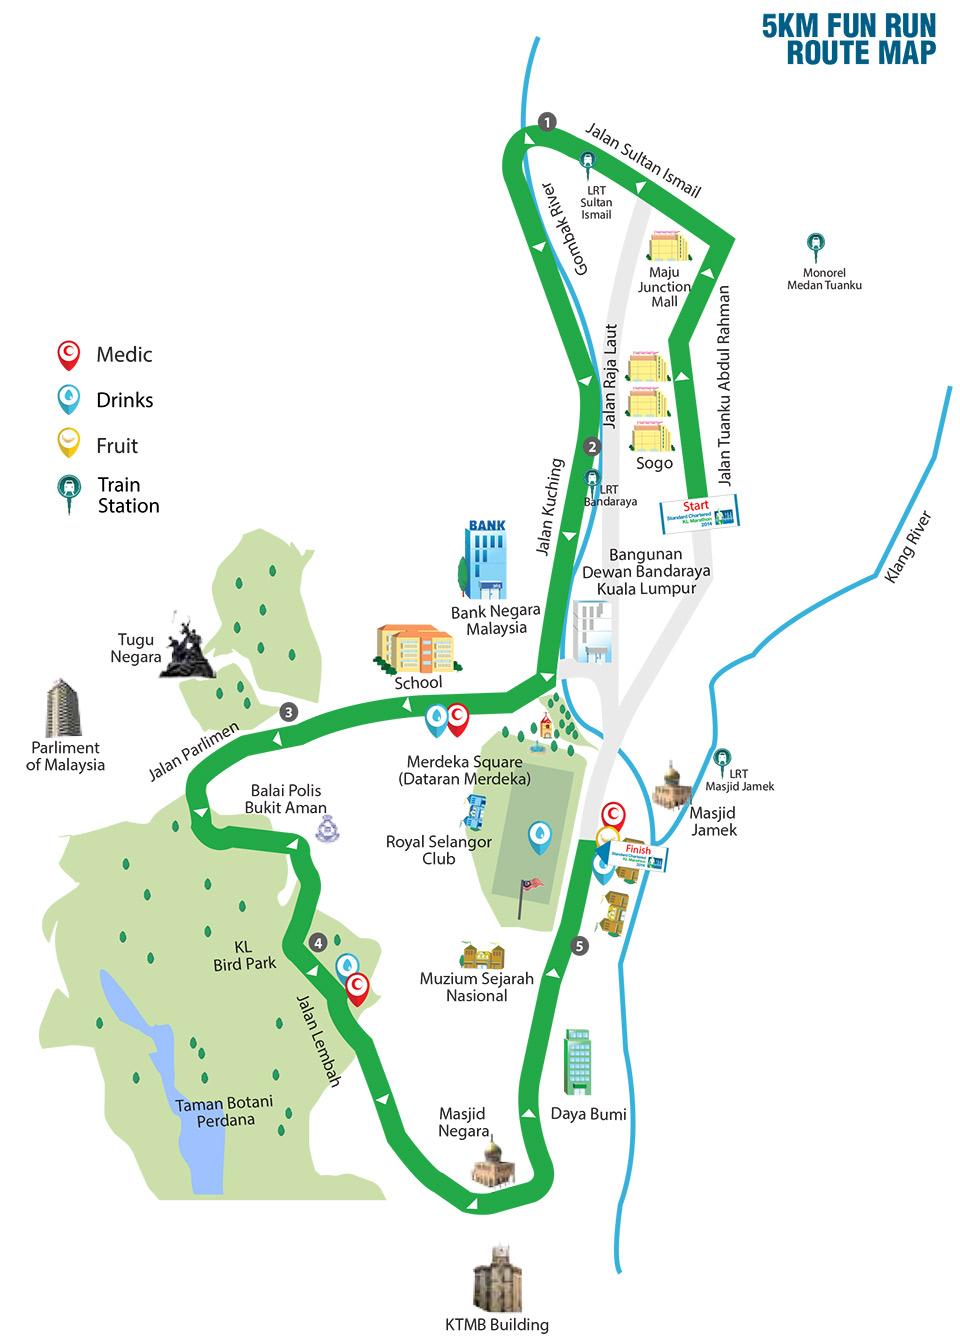 Standard Chartered Marathon KL 2014: 5km Route Map